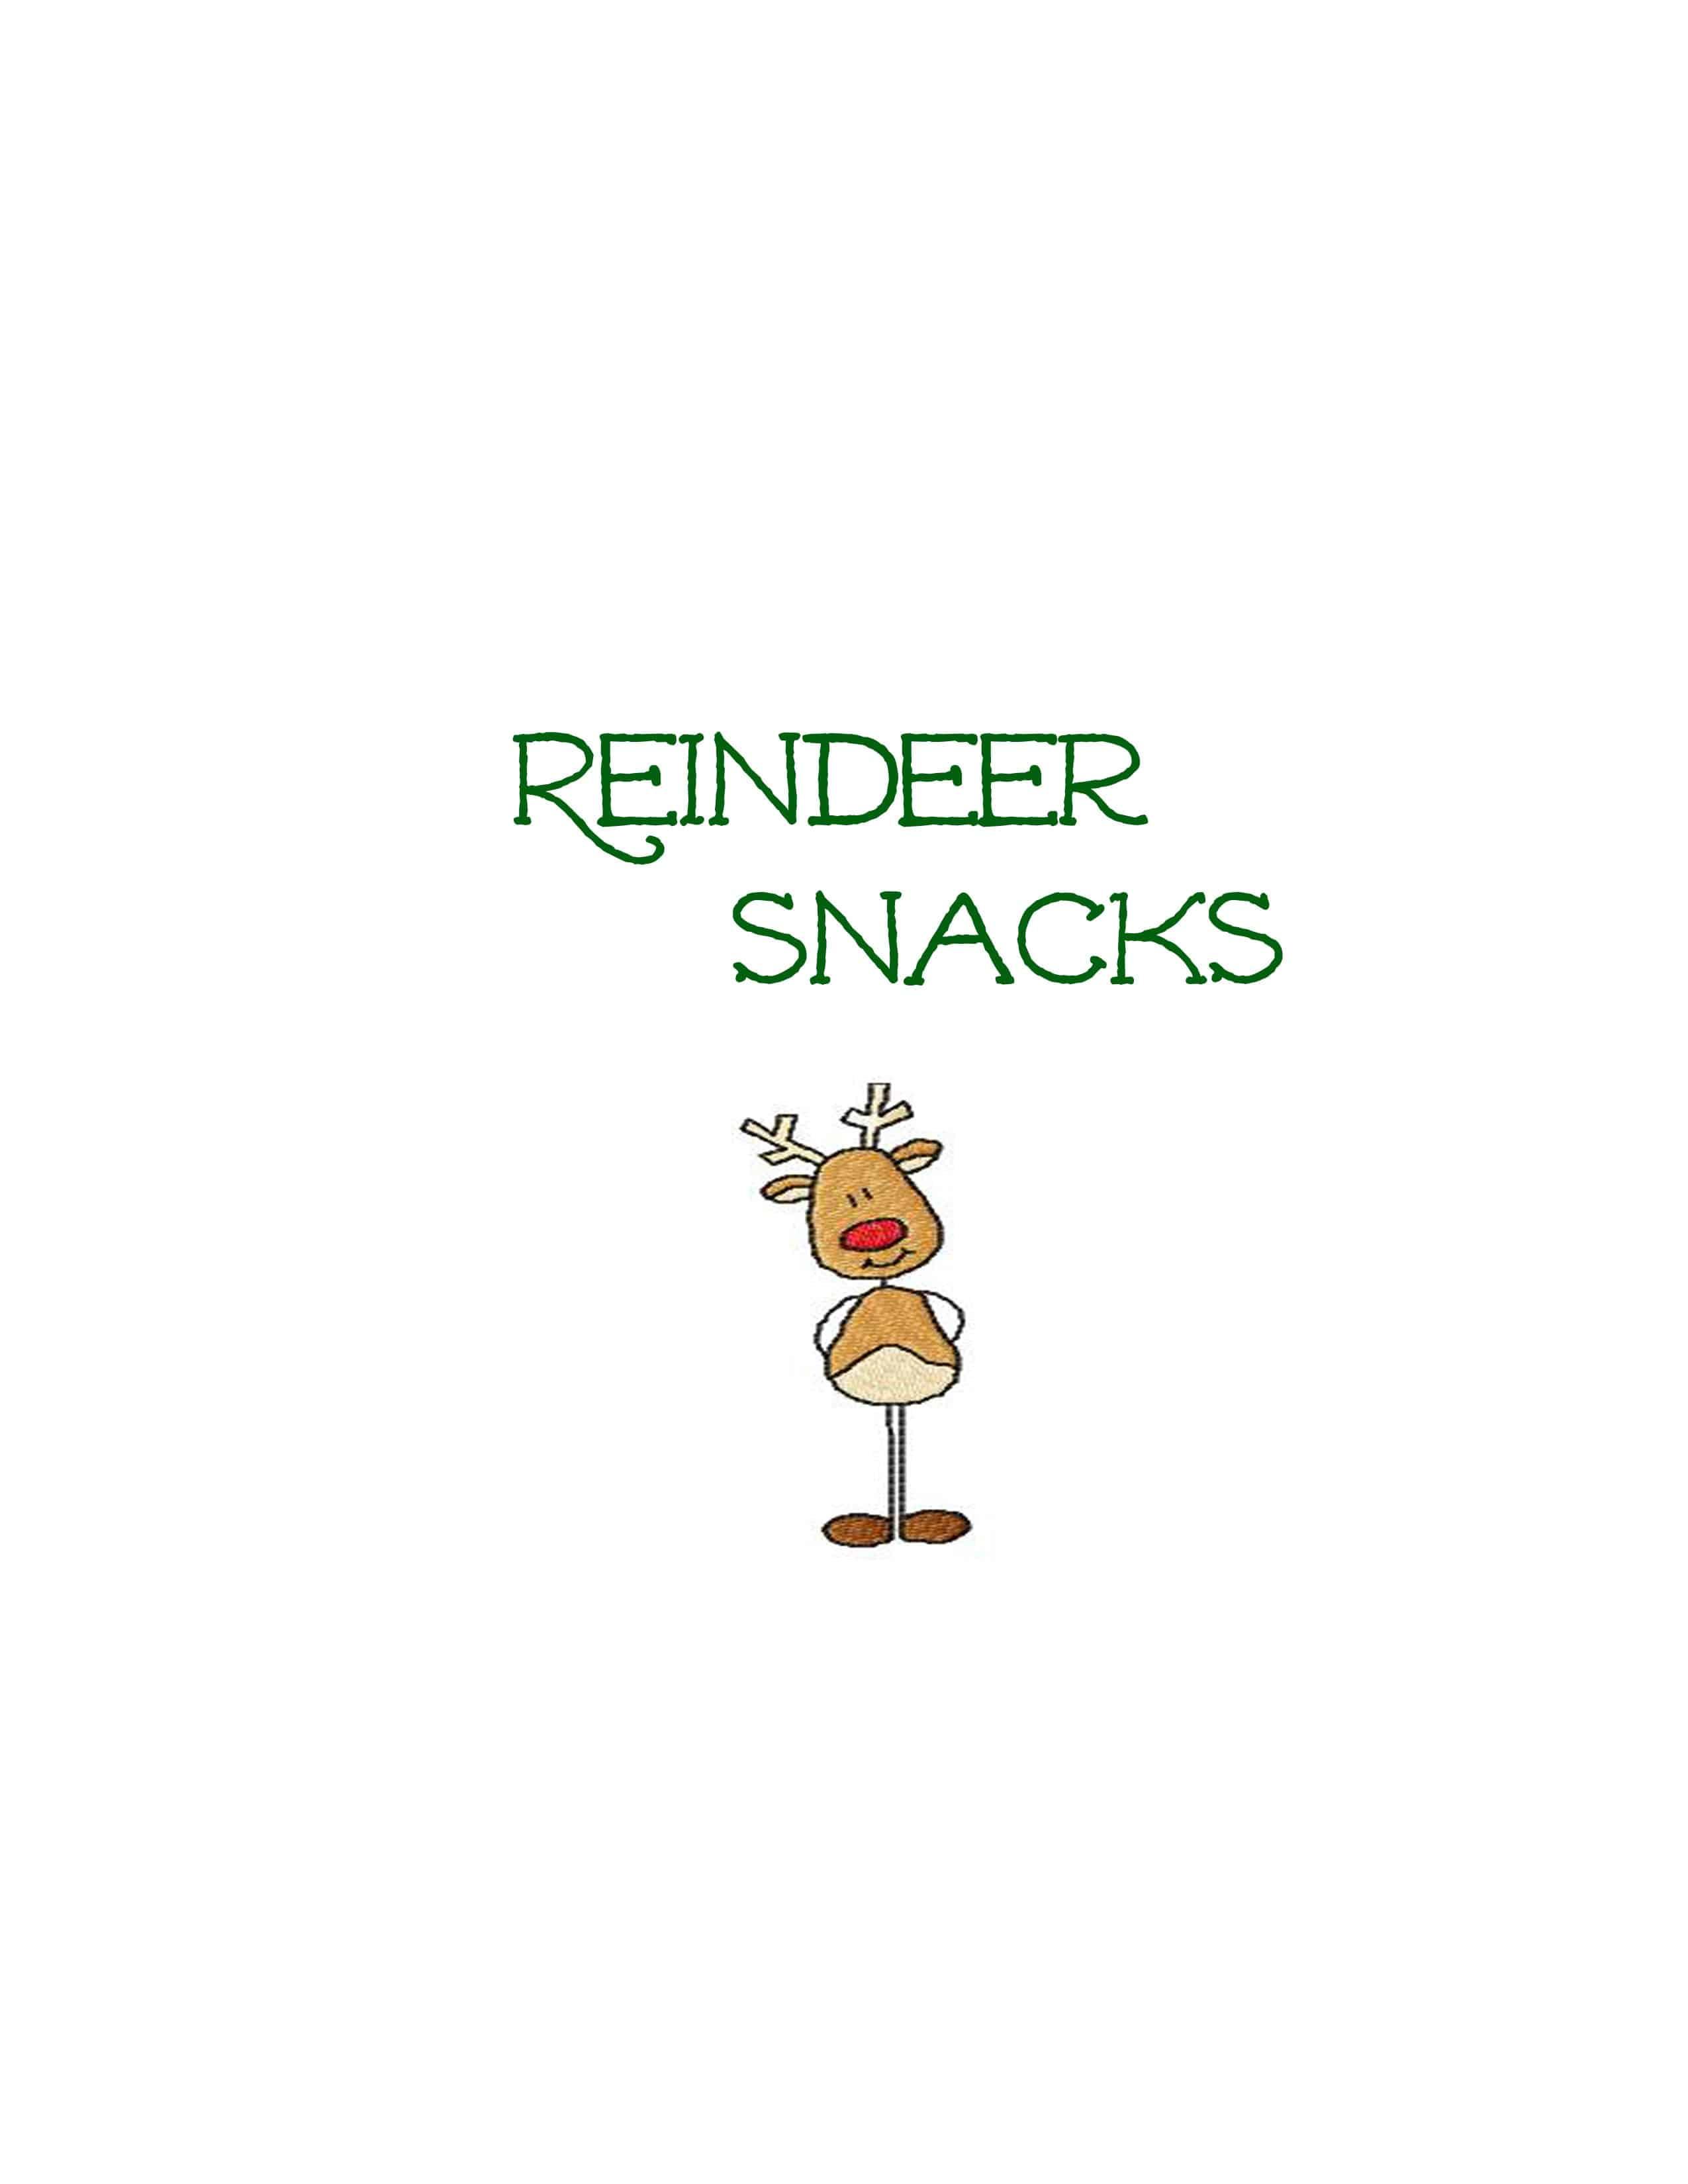 Easy DIY Christmas Plate: Cookies for Santa and Reindeer Snacks | The ...